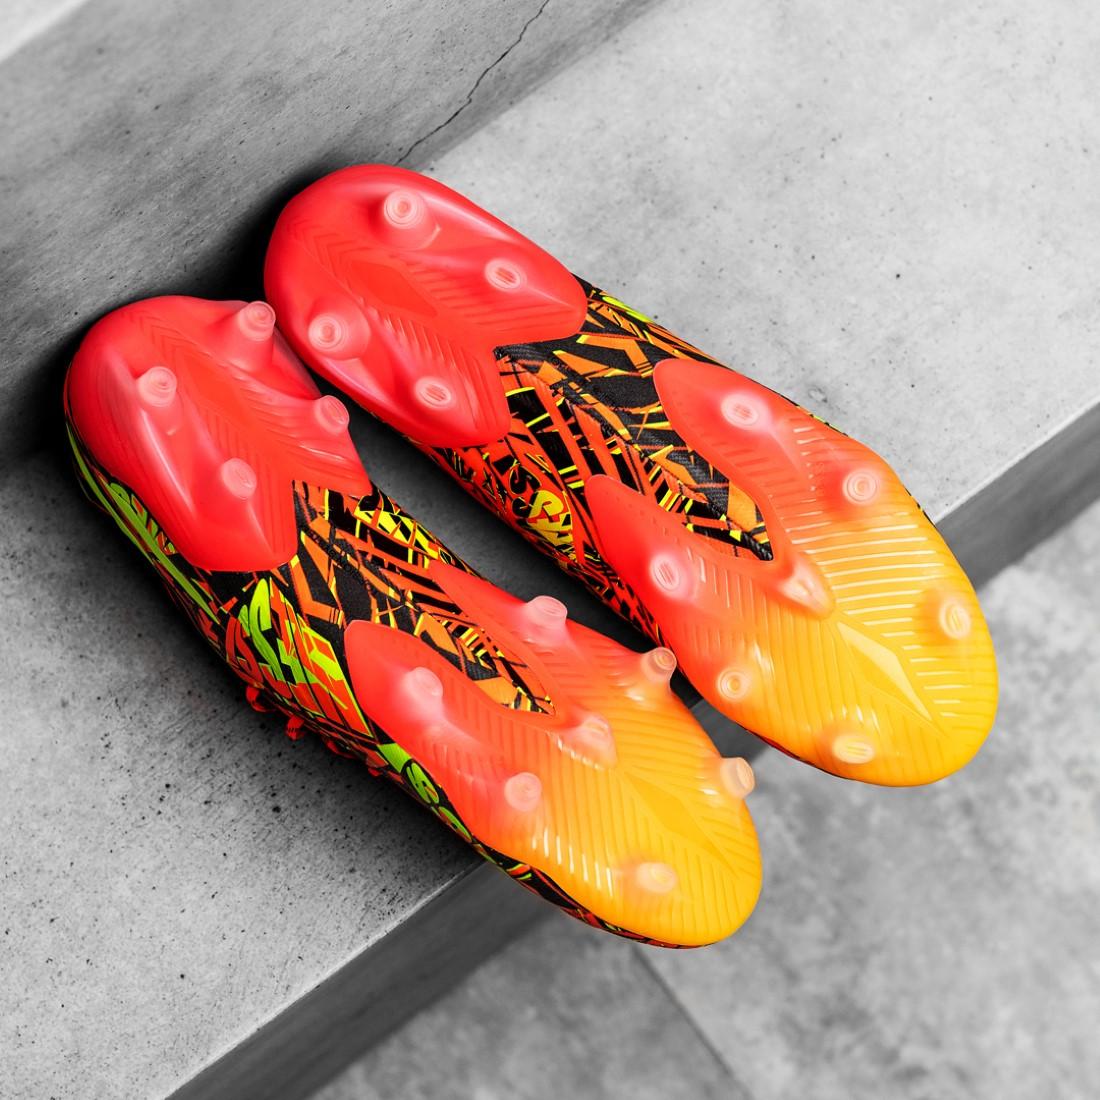 Lionel Messi x adidas Nemeziz.1 Rey del balon